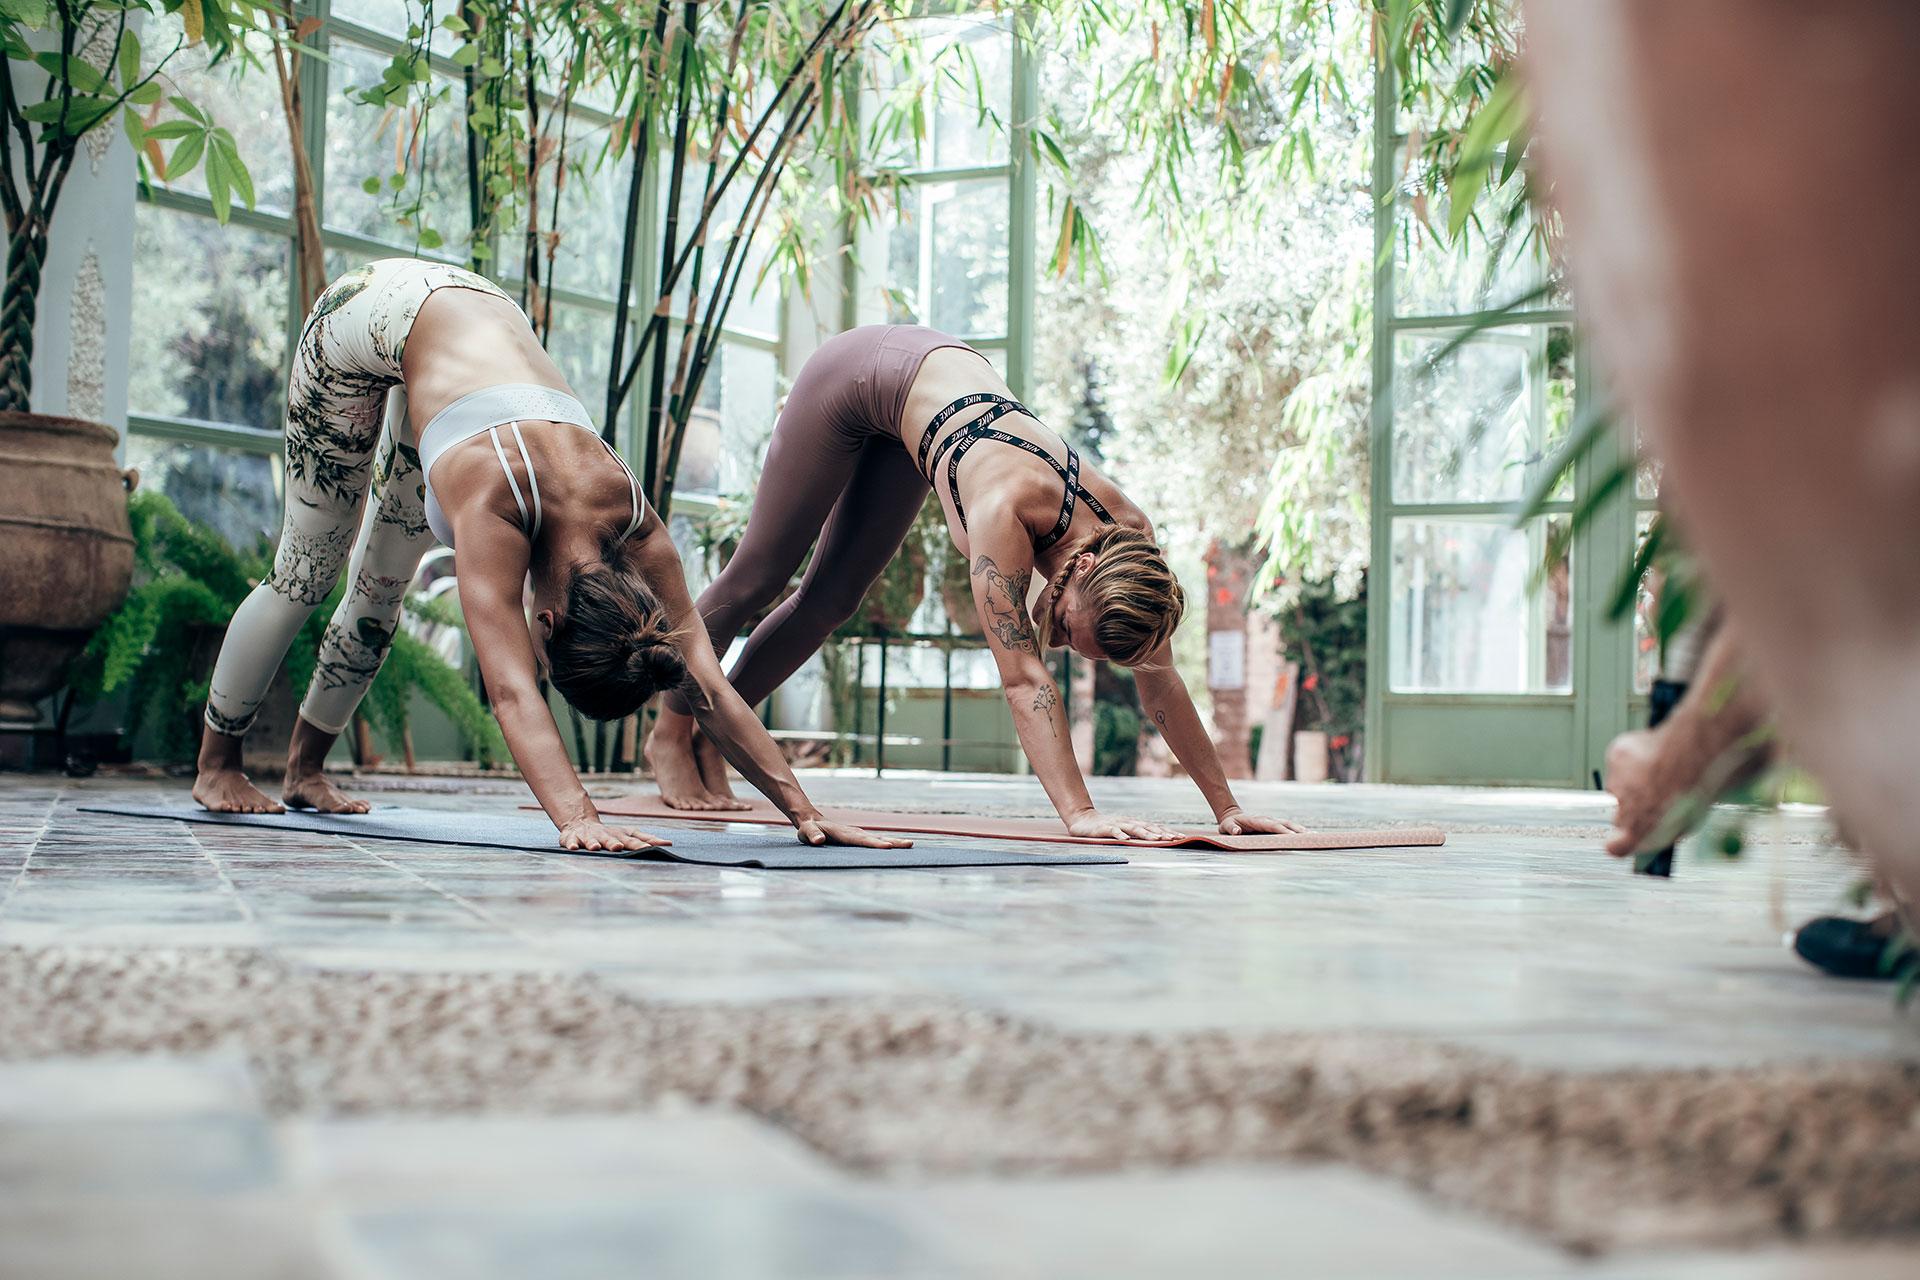 Streching Yoga Sport Bekleidung Klamotte Fotograf Fitness Michael Müller